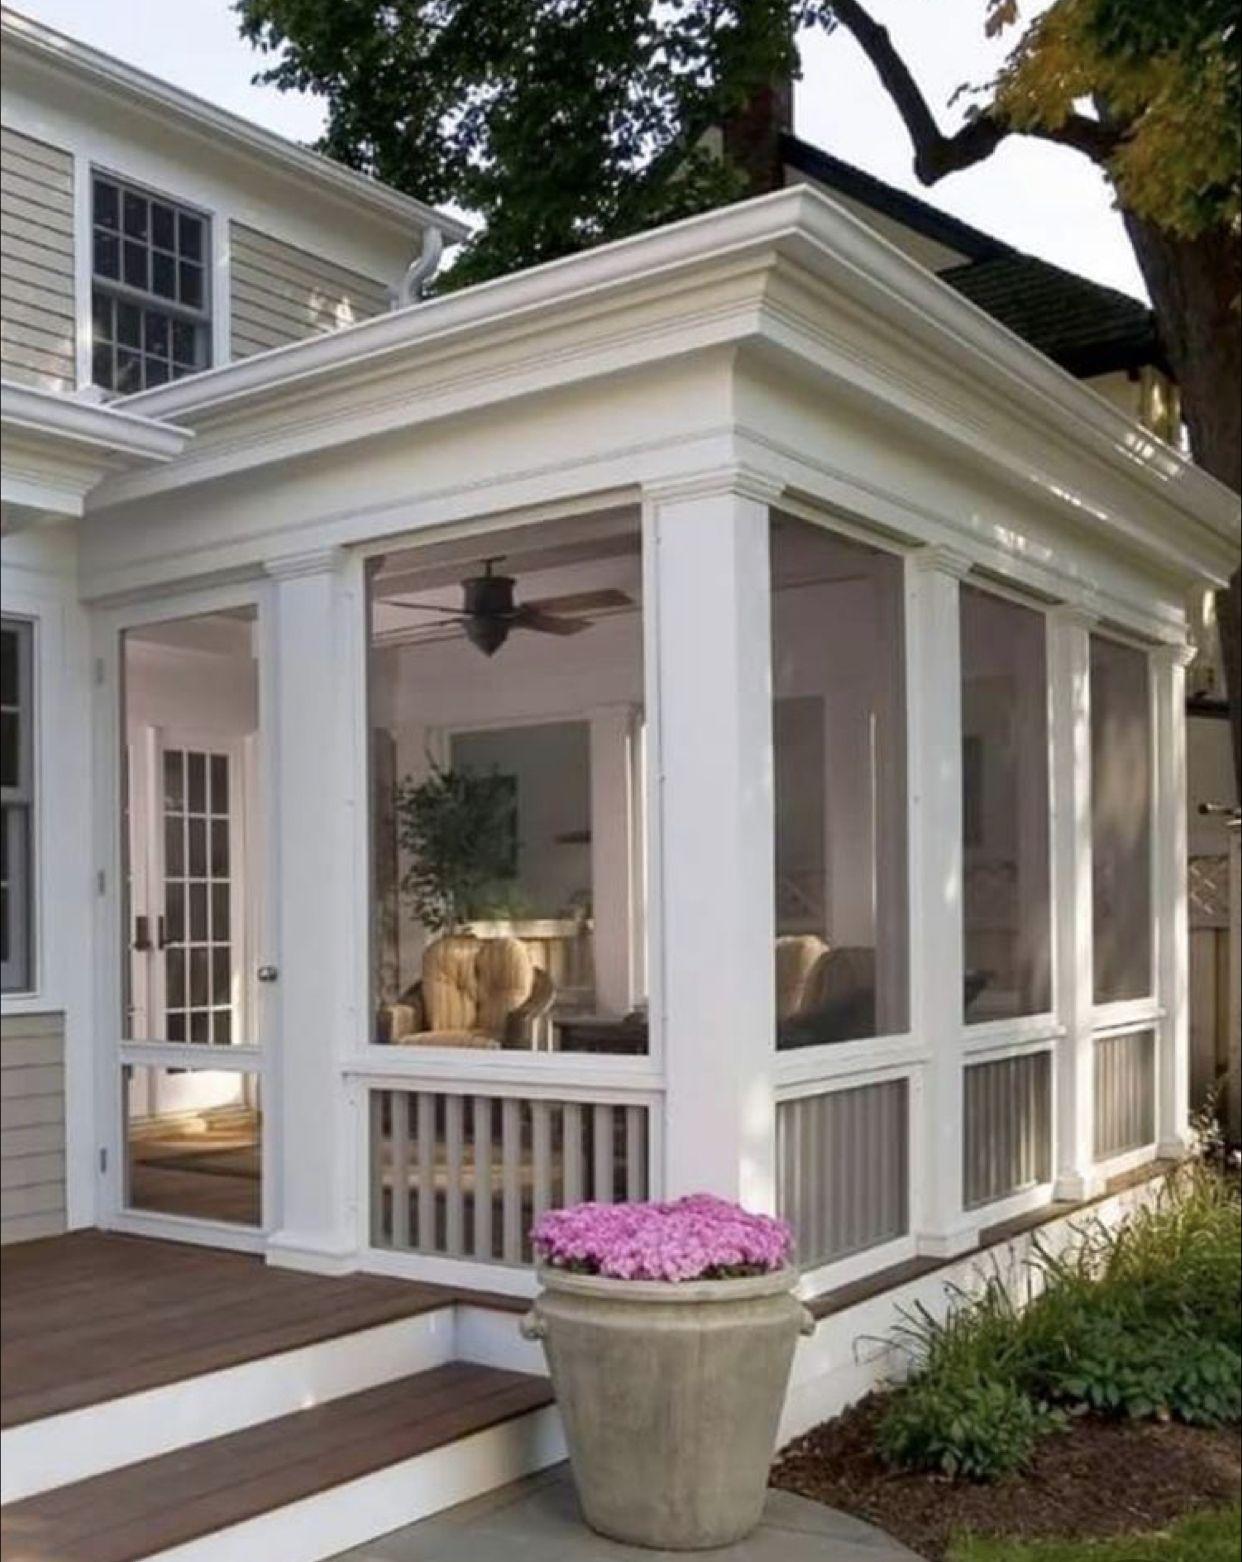 Back Porch Paradise Back Porch Designs Porch Design House With Porch Backyard porch ideas for houses